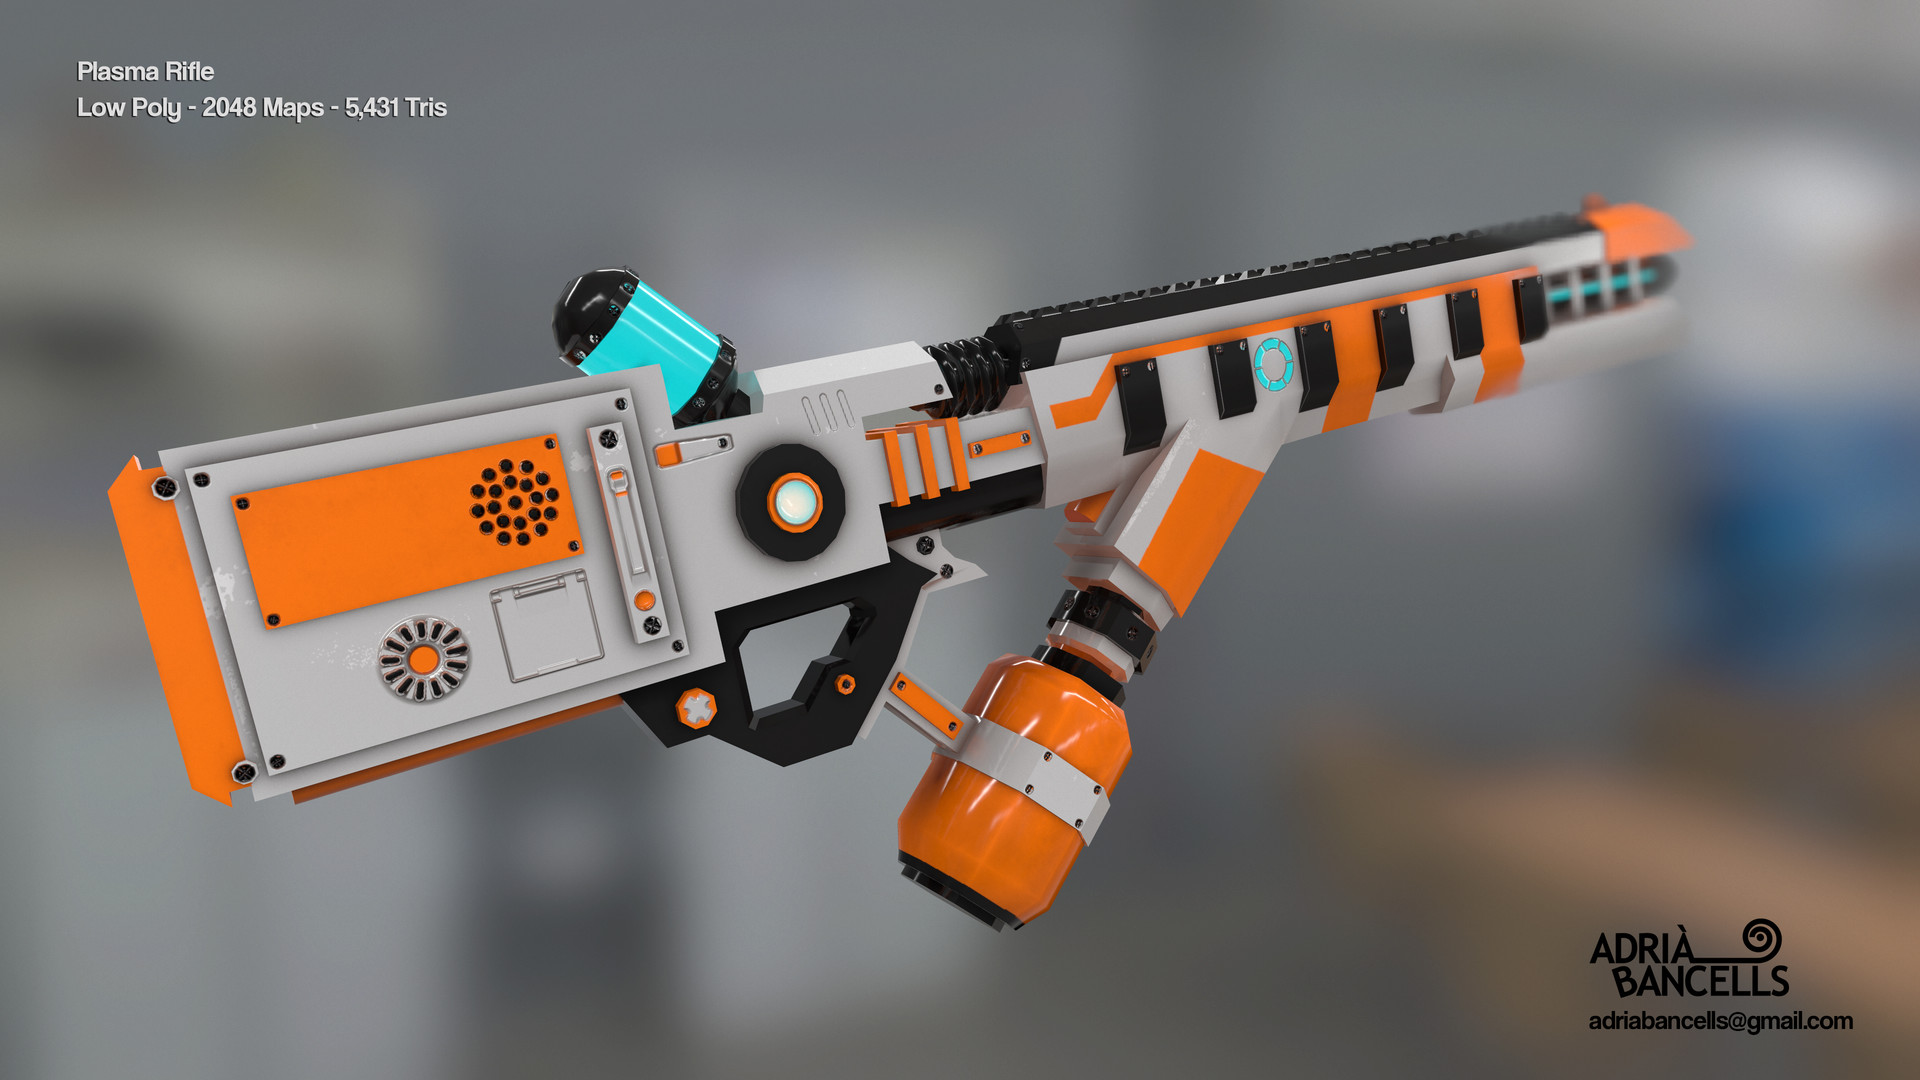 Adria bancells plasma rifle2